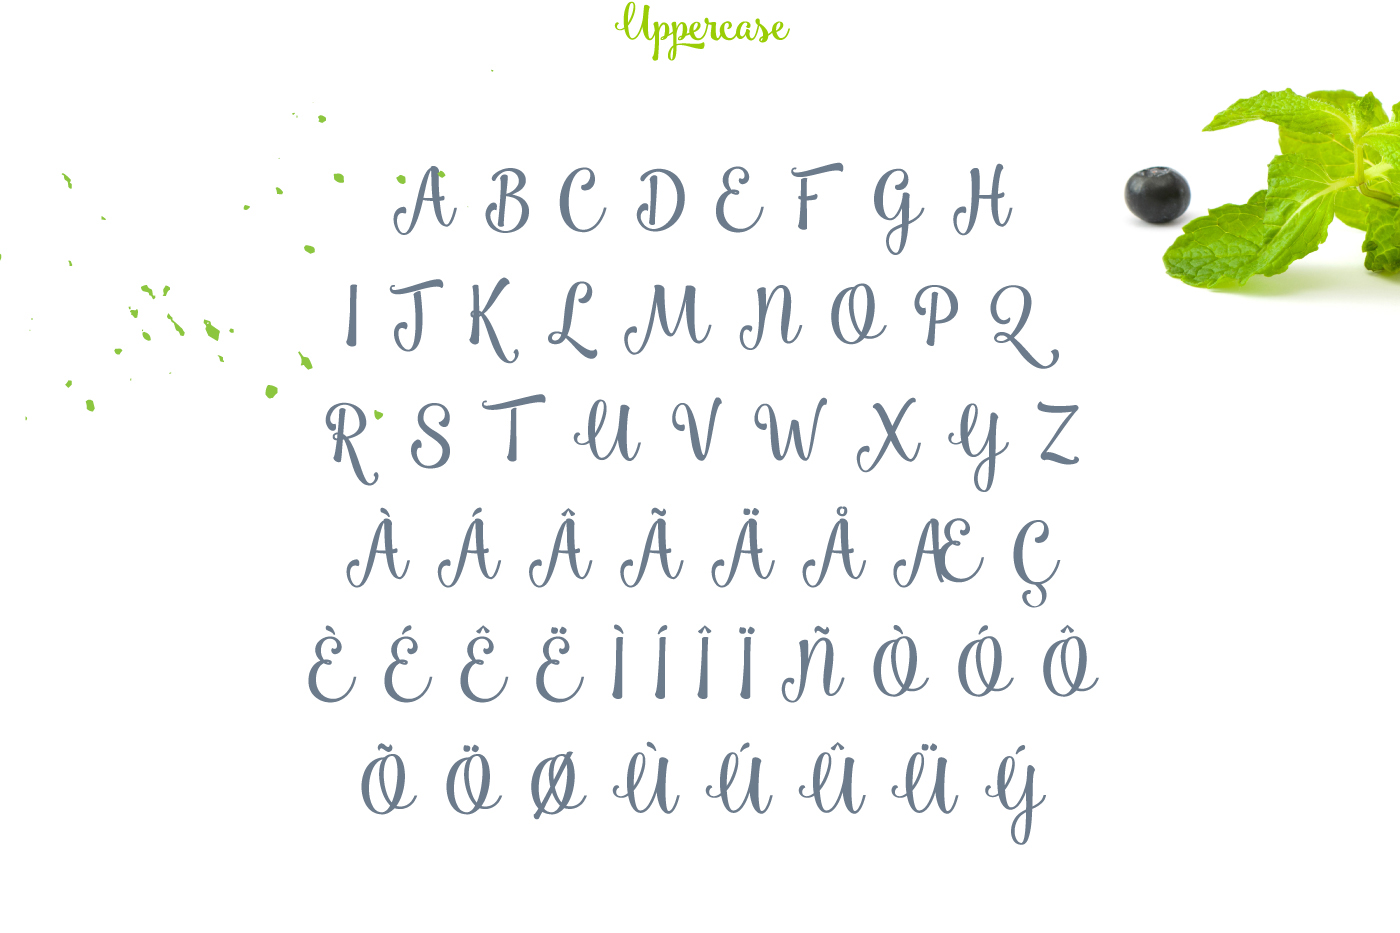 Free Script Font free font fonts freebie Free font free fonts Script Display brush handwritten creative inspiration download personal